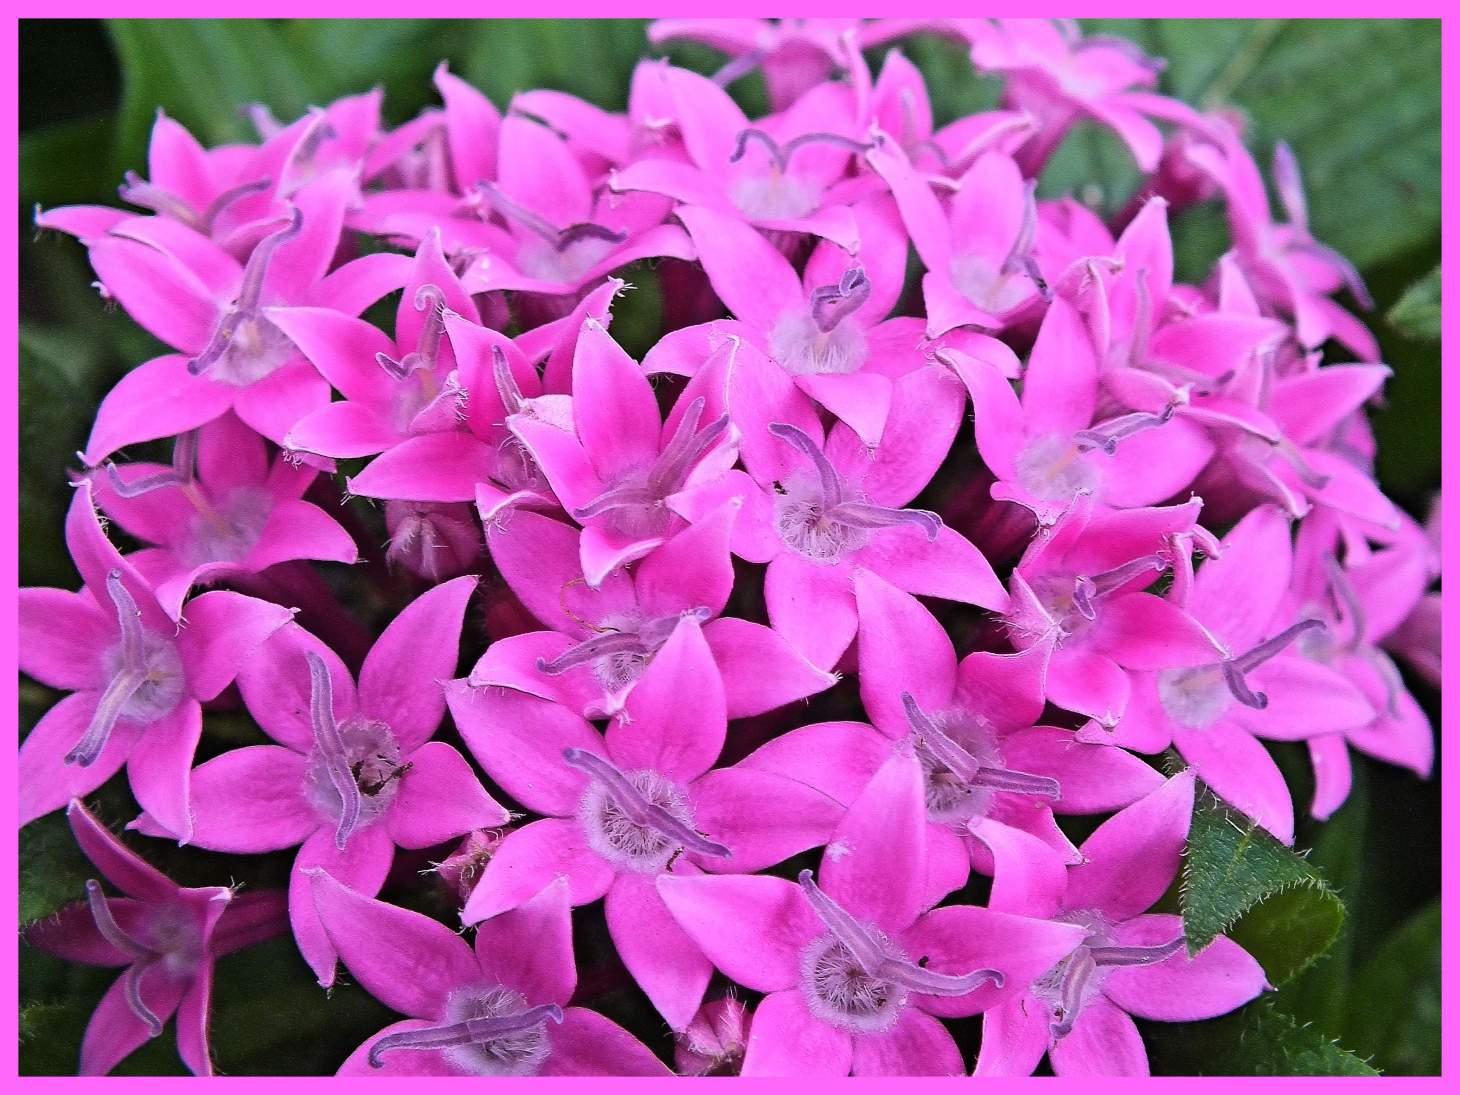 Plush Pink. Photo by Thomas Peace c. 2015